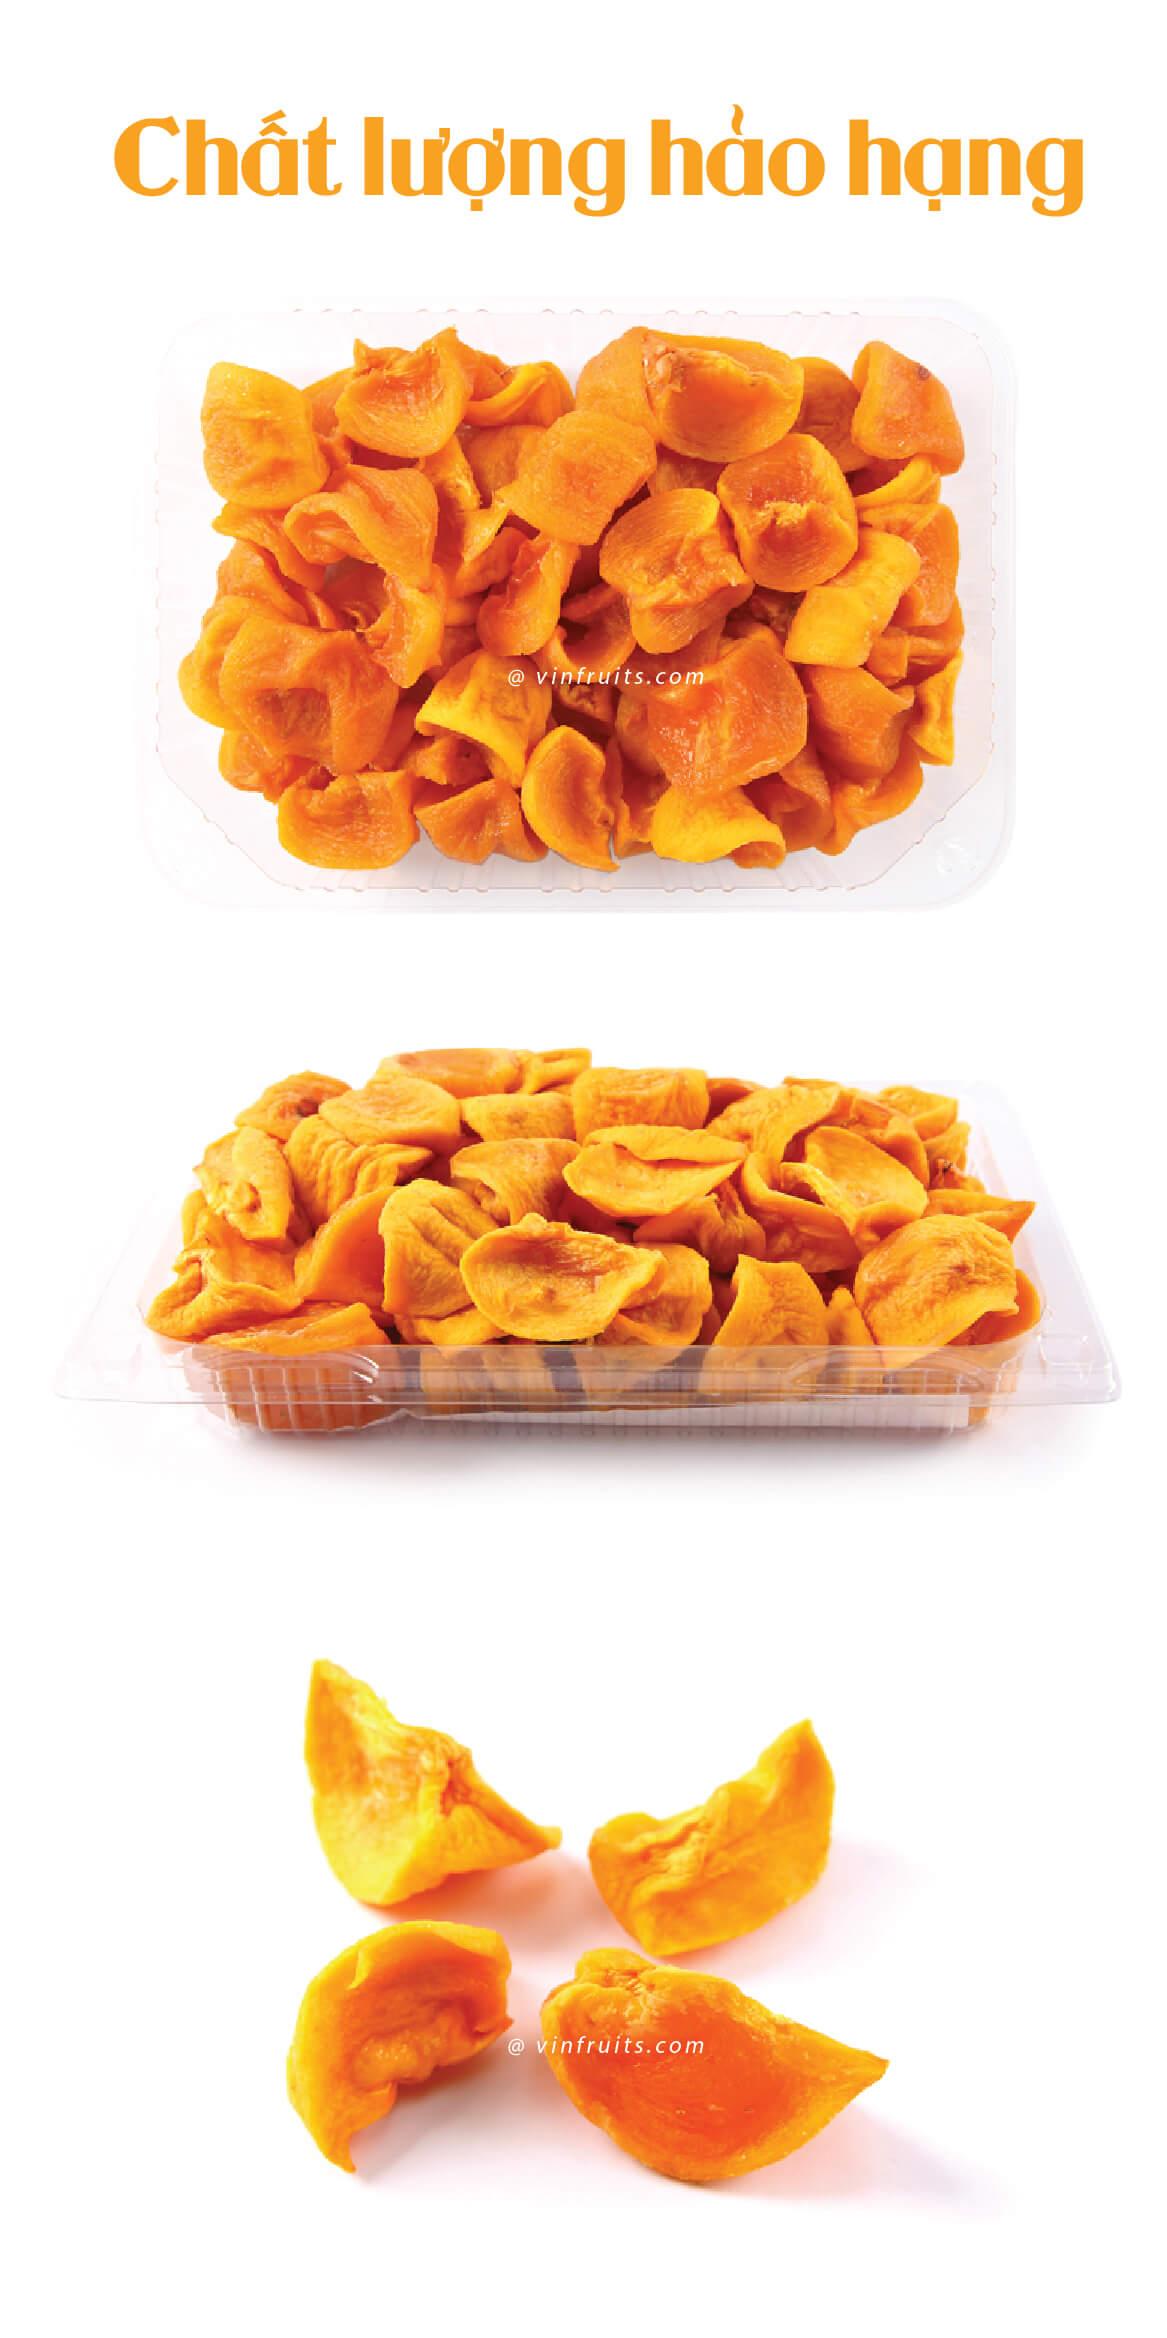 Hong lat mot nang Han Quoc - vinfrutis.com 4